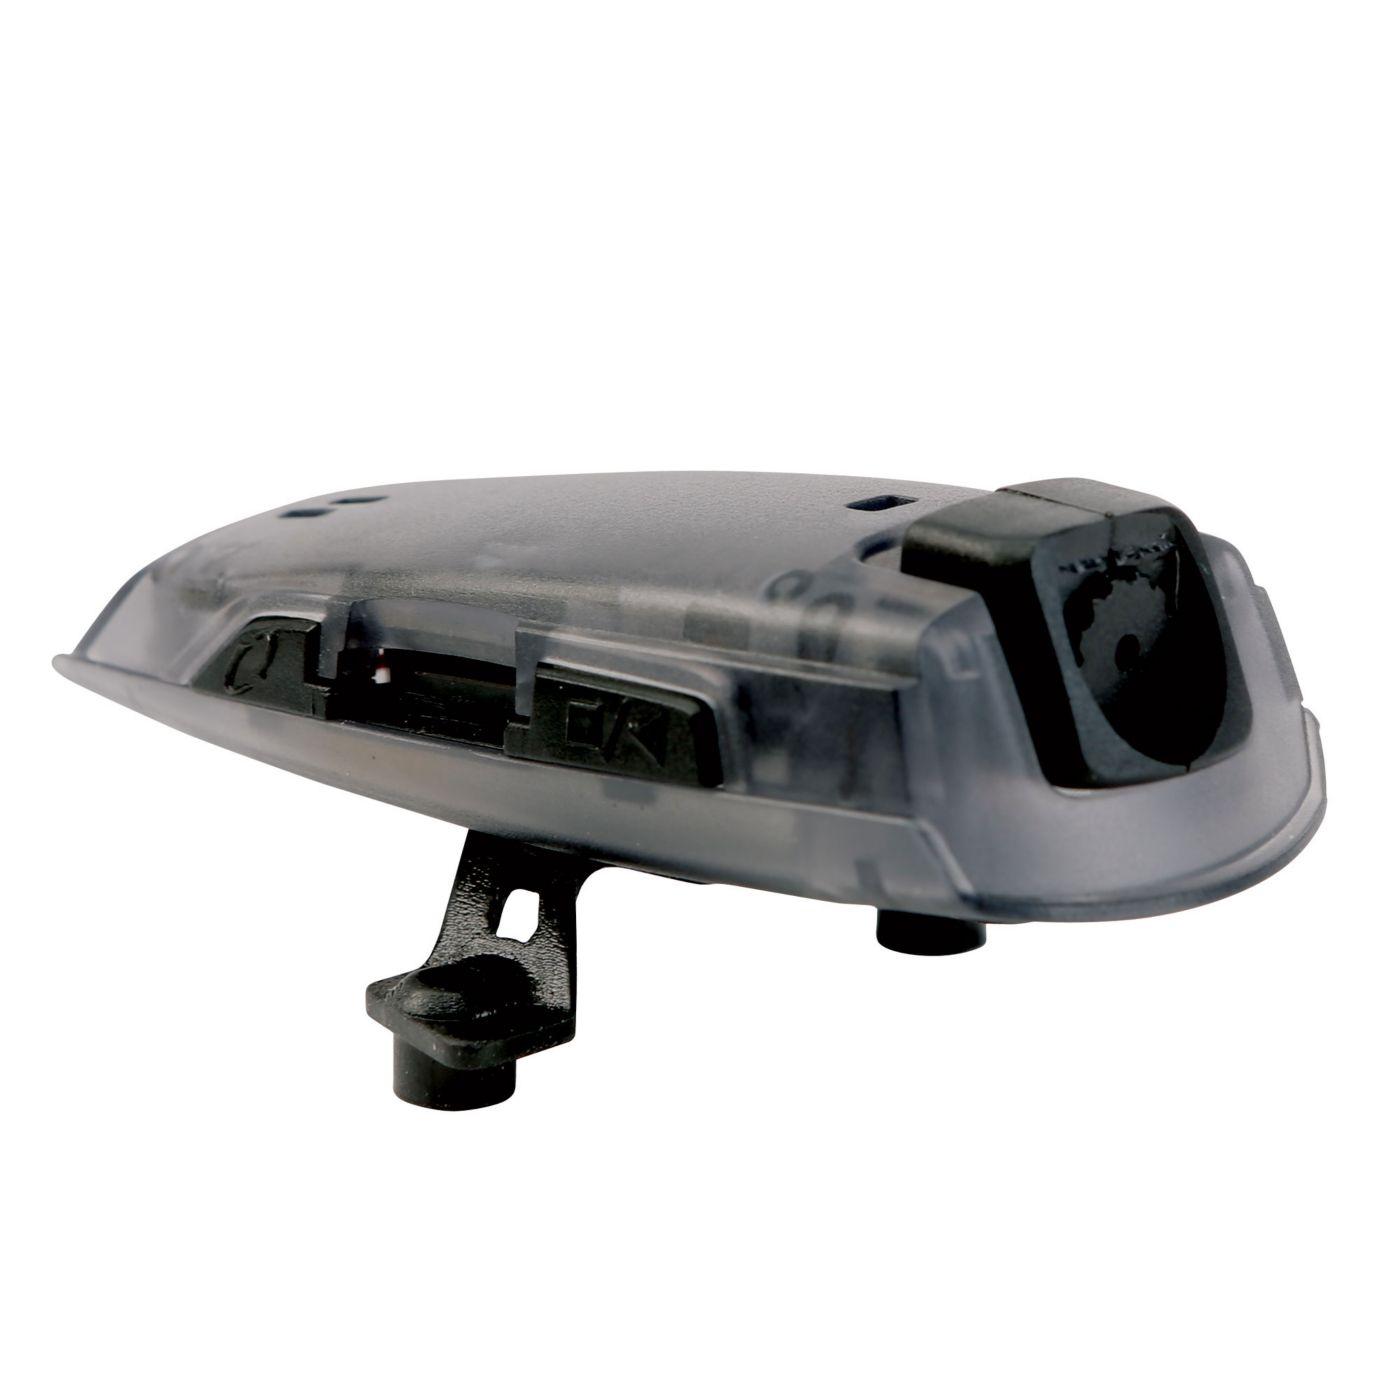 EFC-721 720p HD Video Camera  (EFLA801)